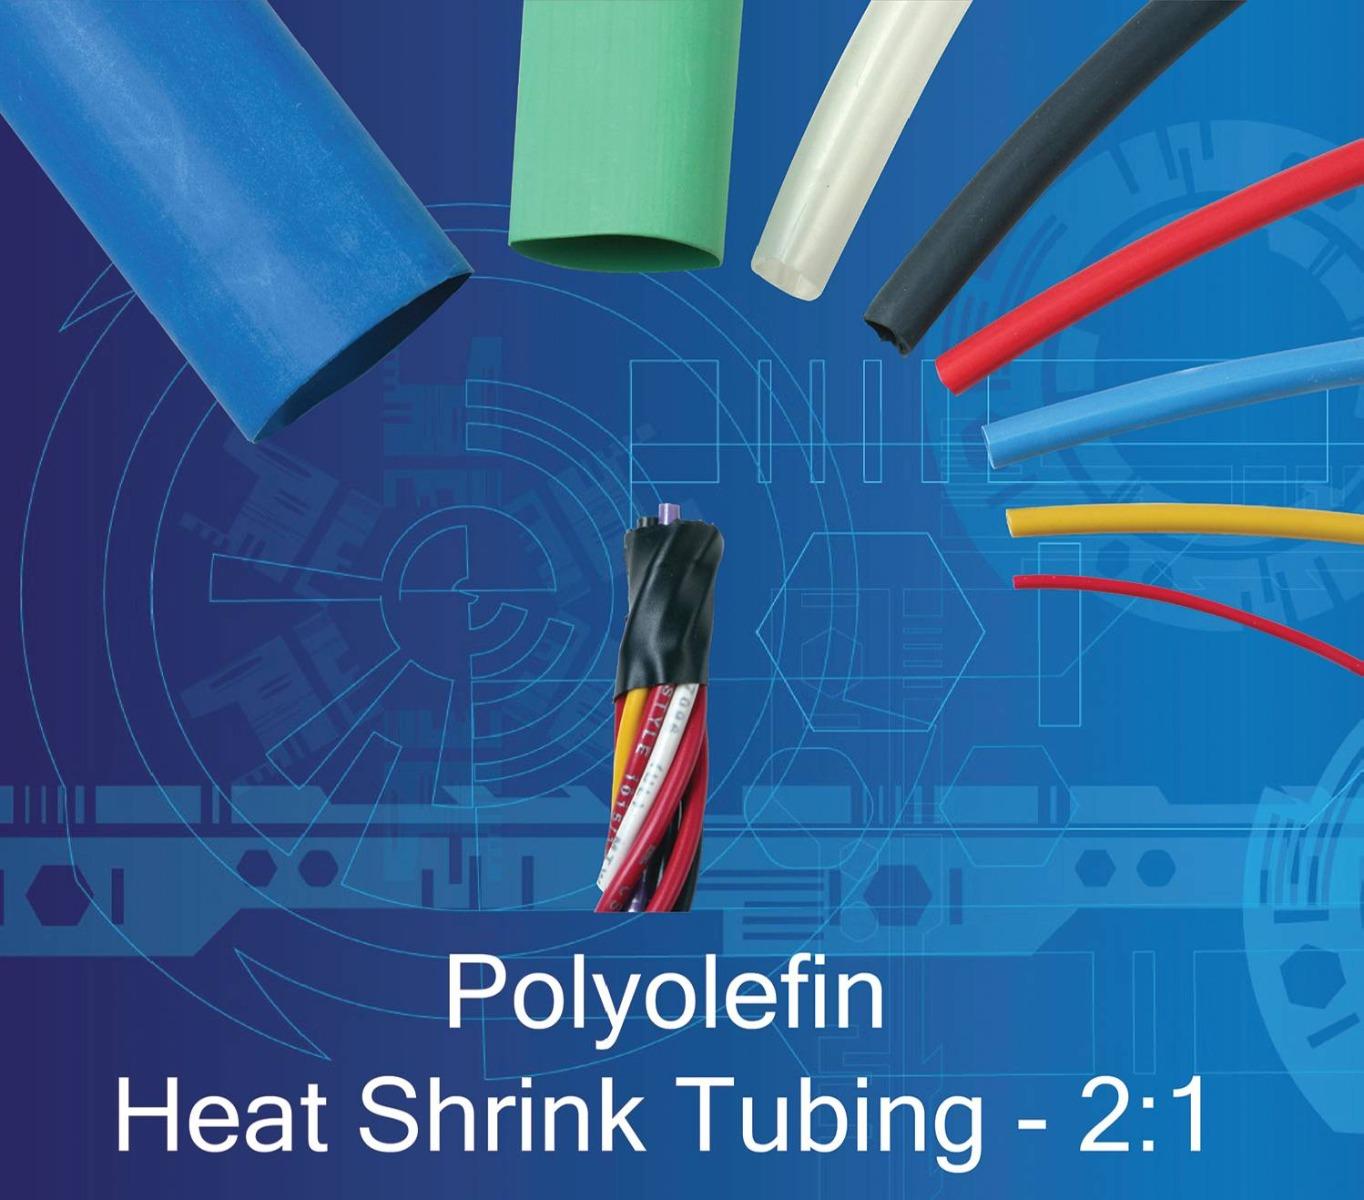 Polyolefin Electrical Heat-Shrink Tubing